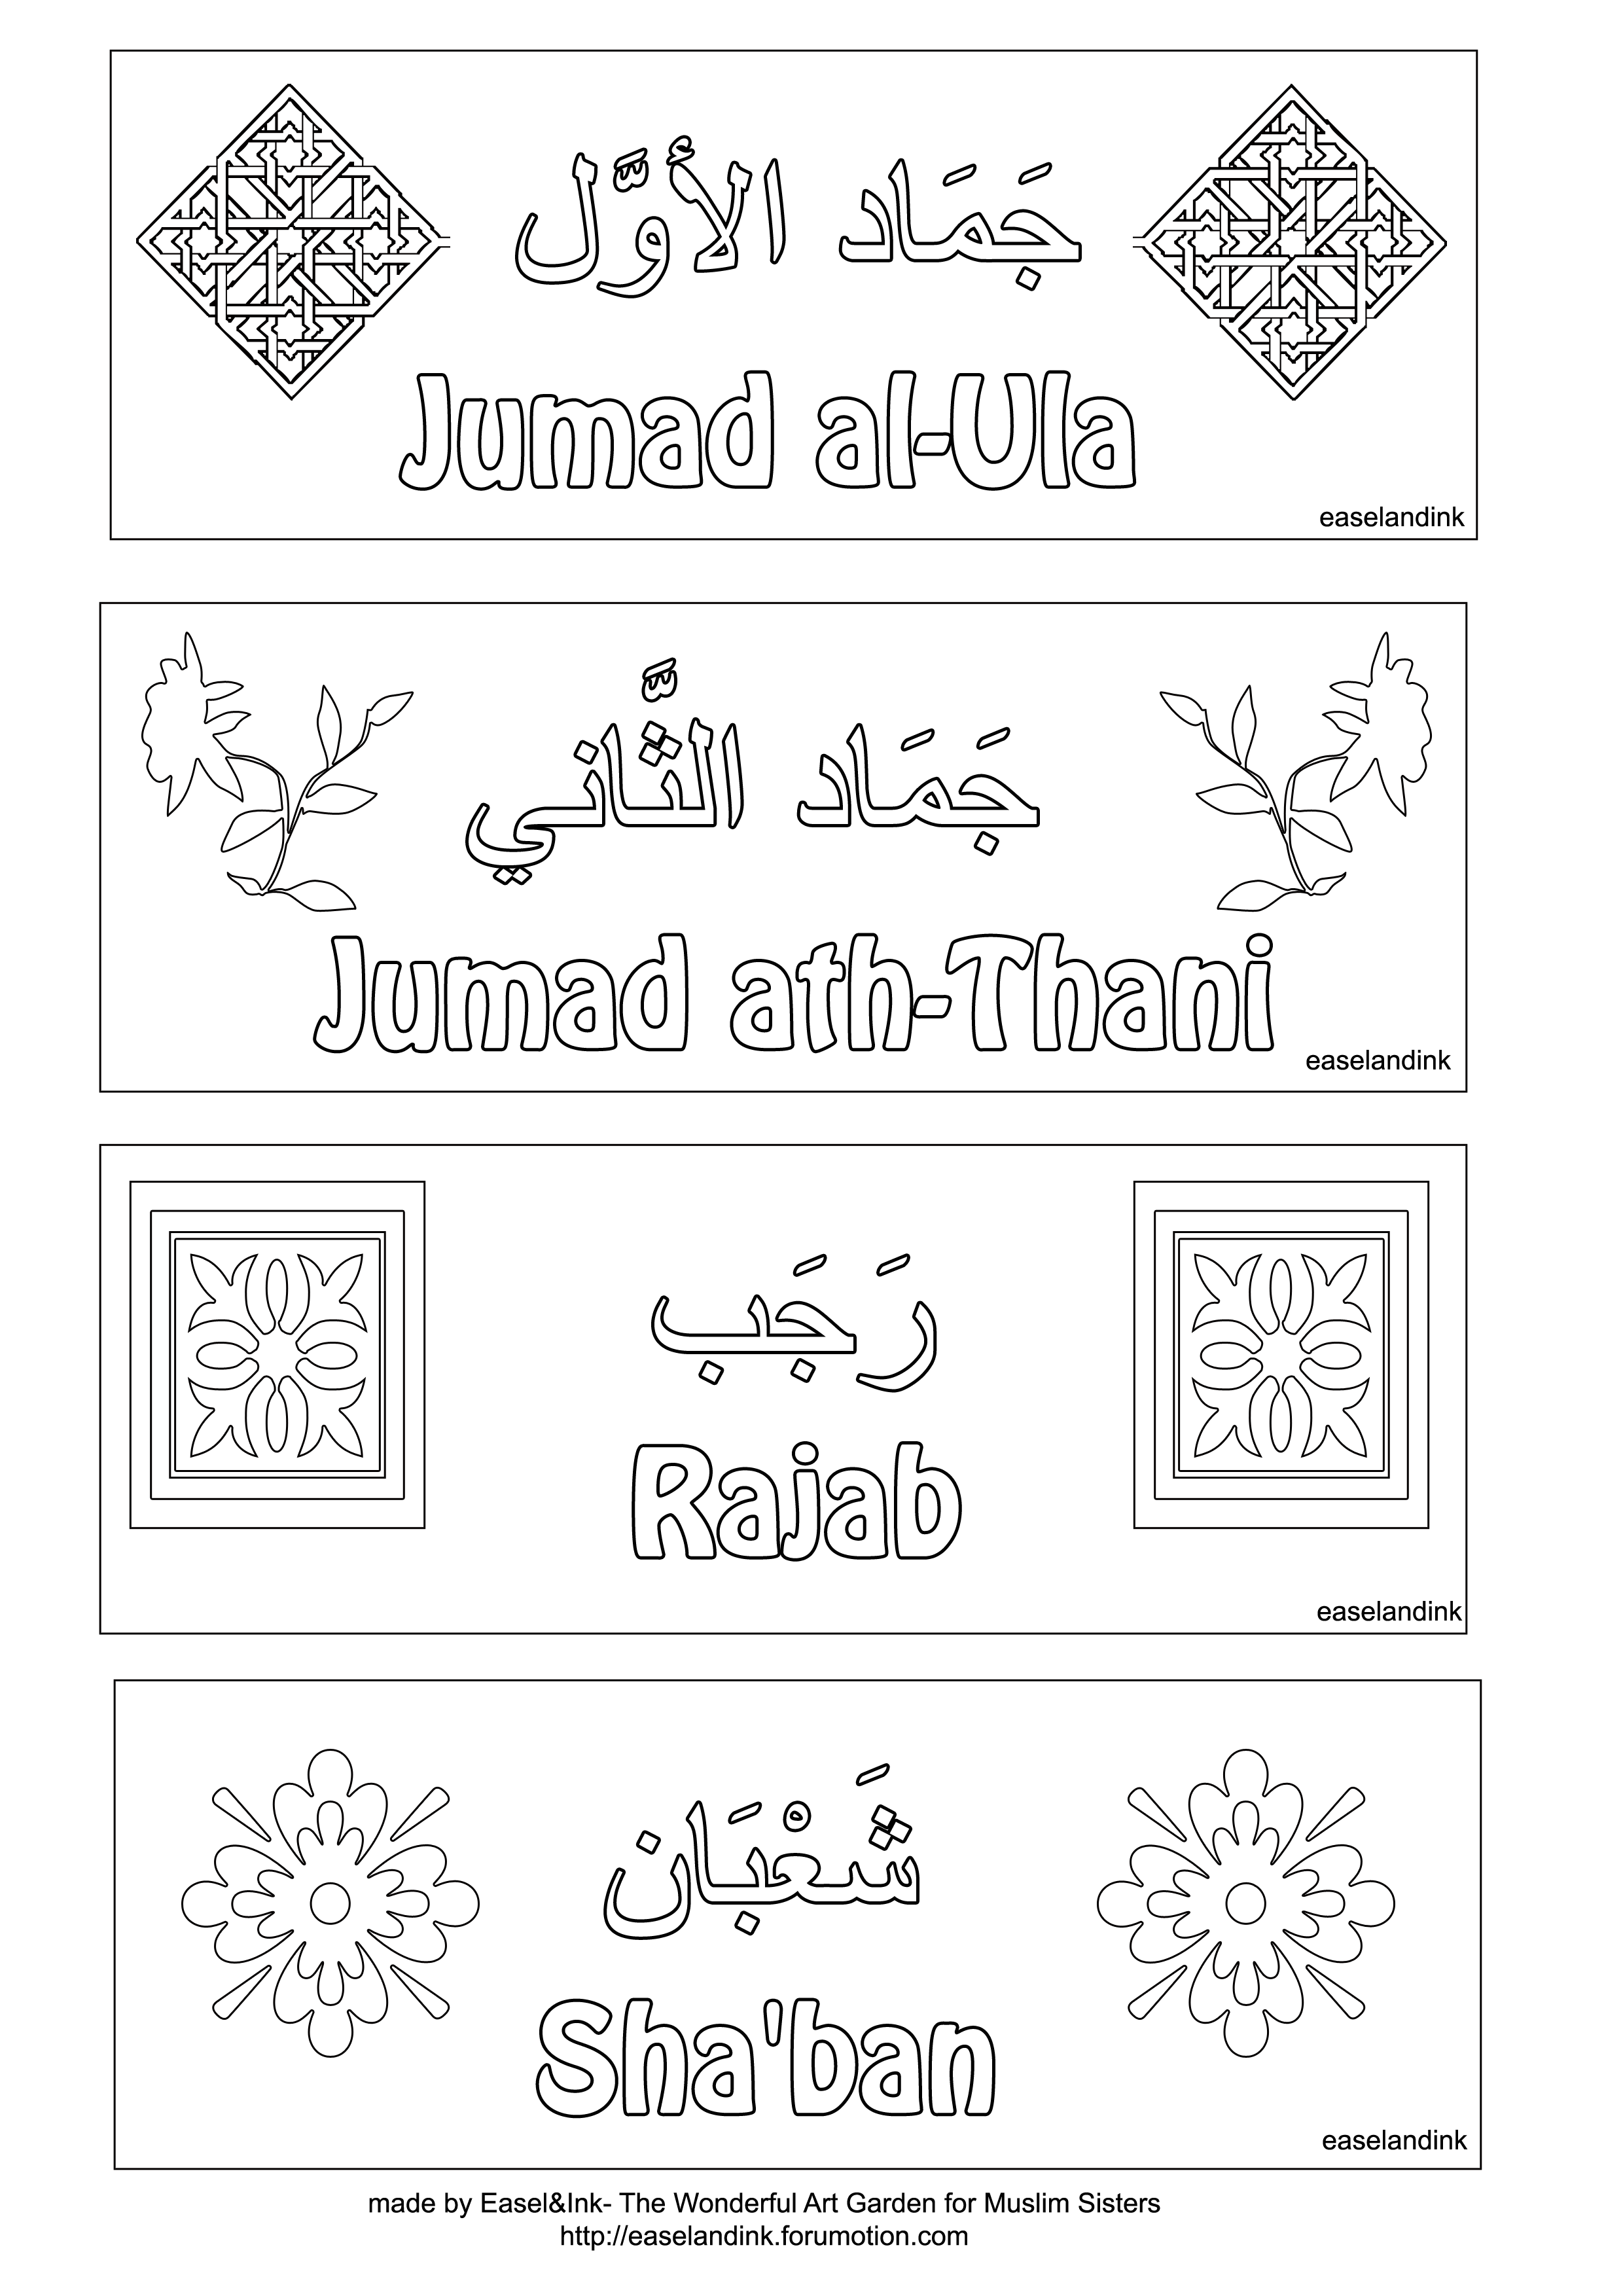 Islamic Months In English And Arabic 5 Jumad Al Ula 6